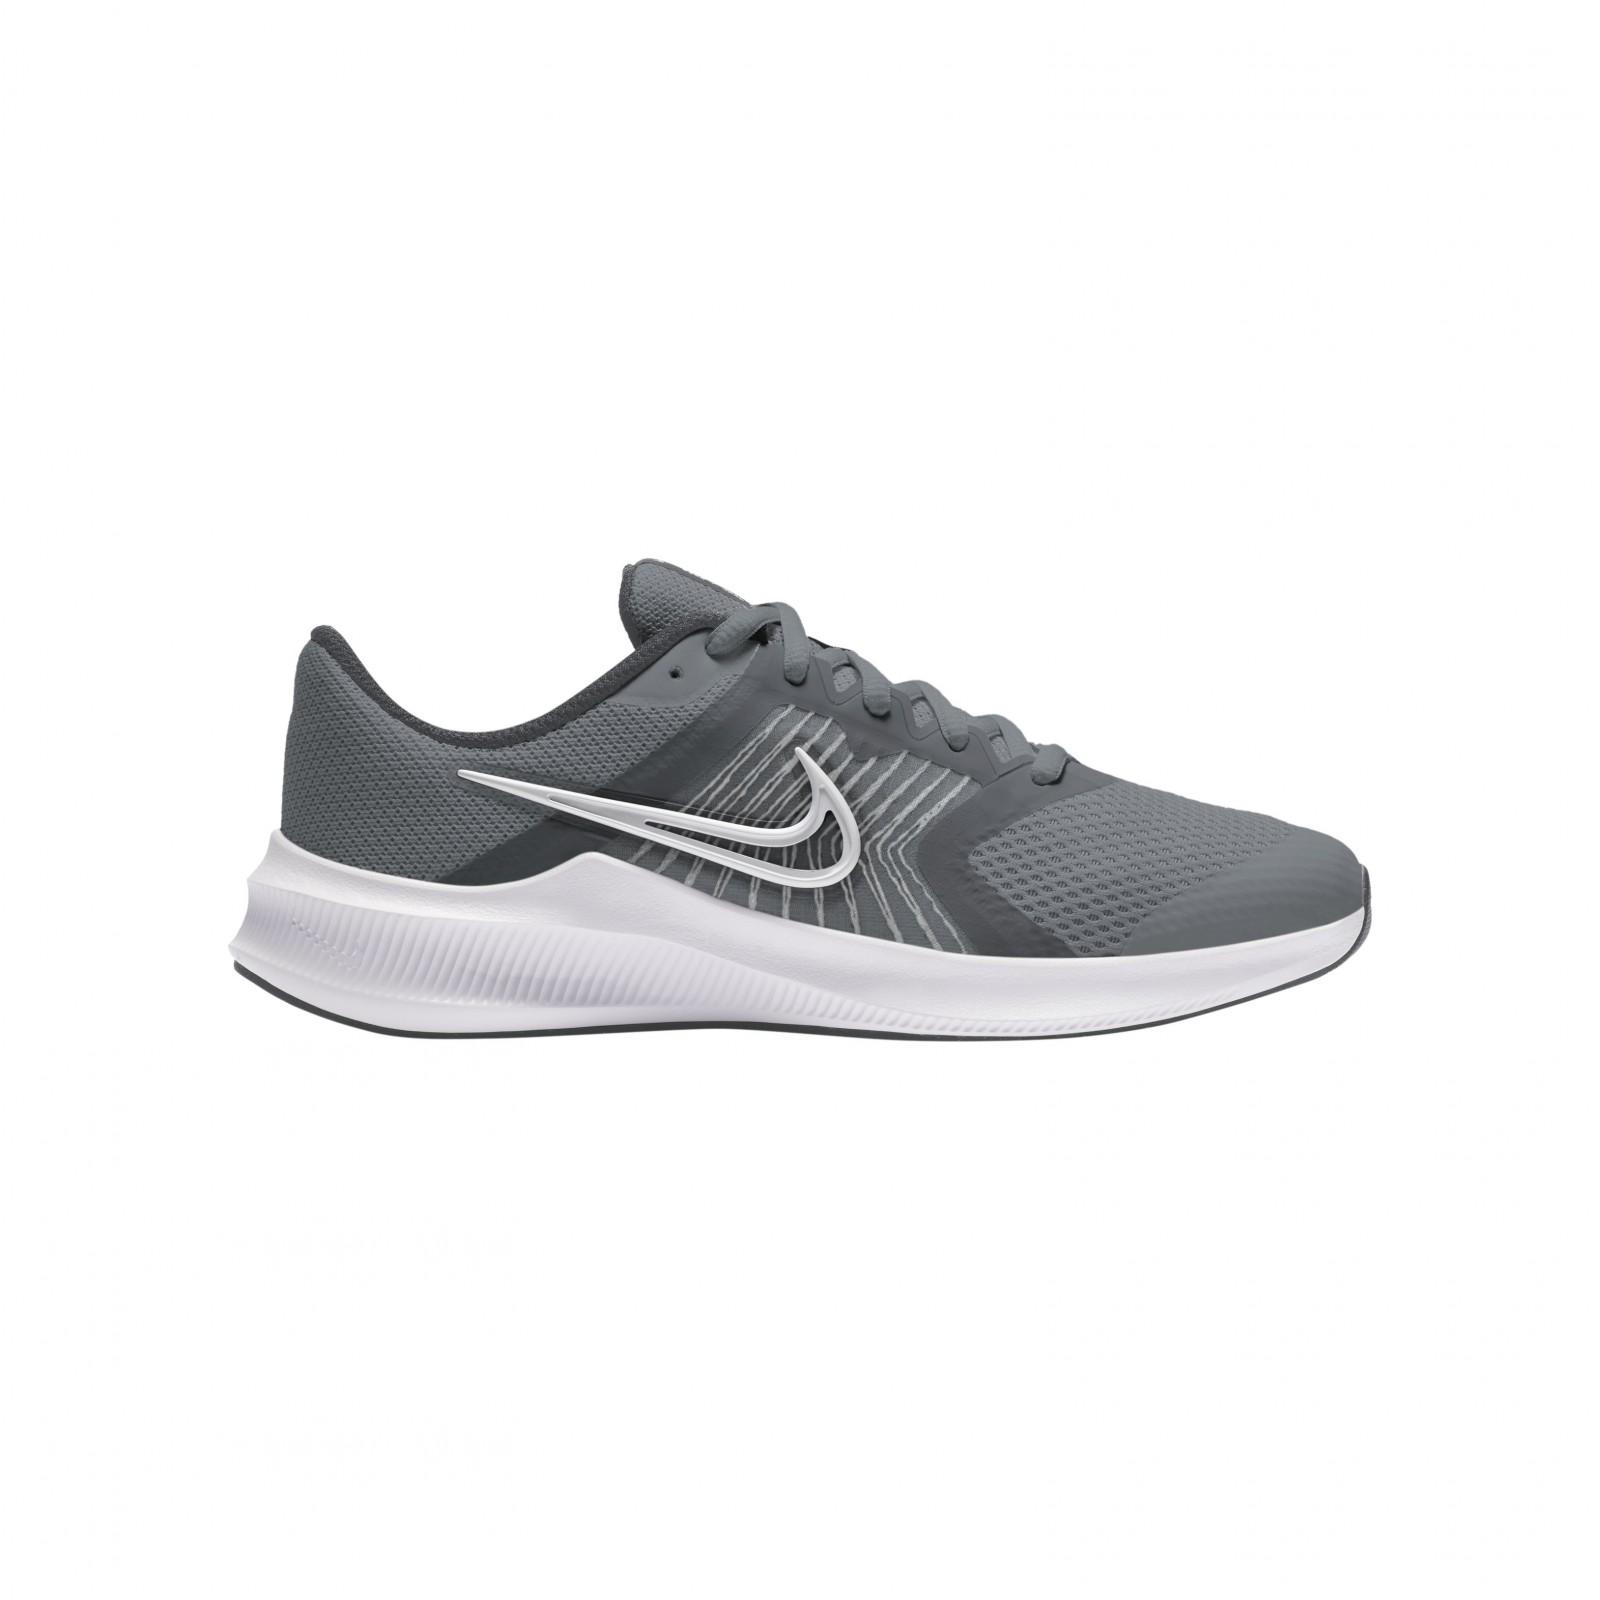 Nike Downshifter 11 SMOKE GREY/WHITE-IRON GREY